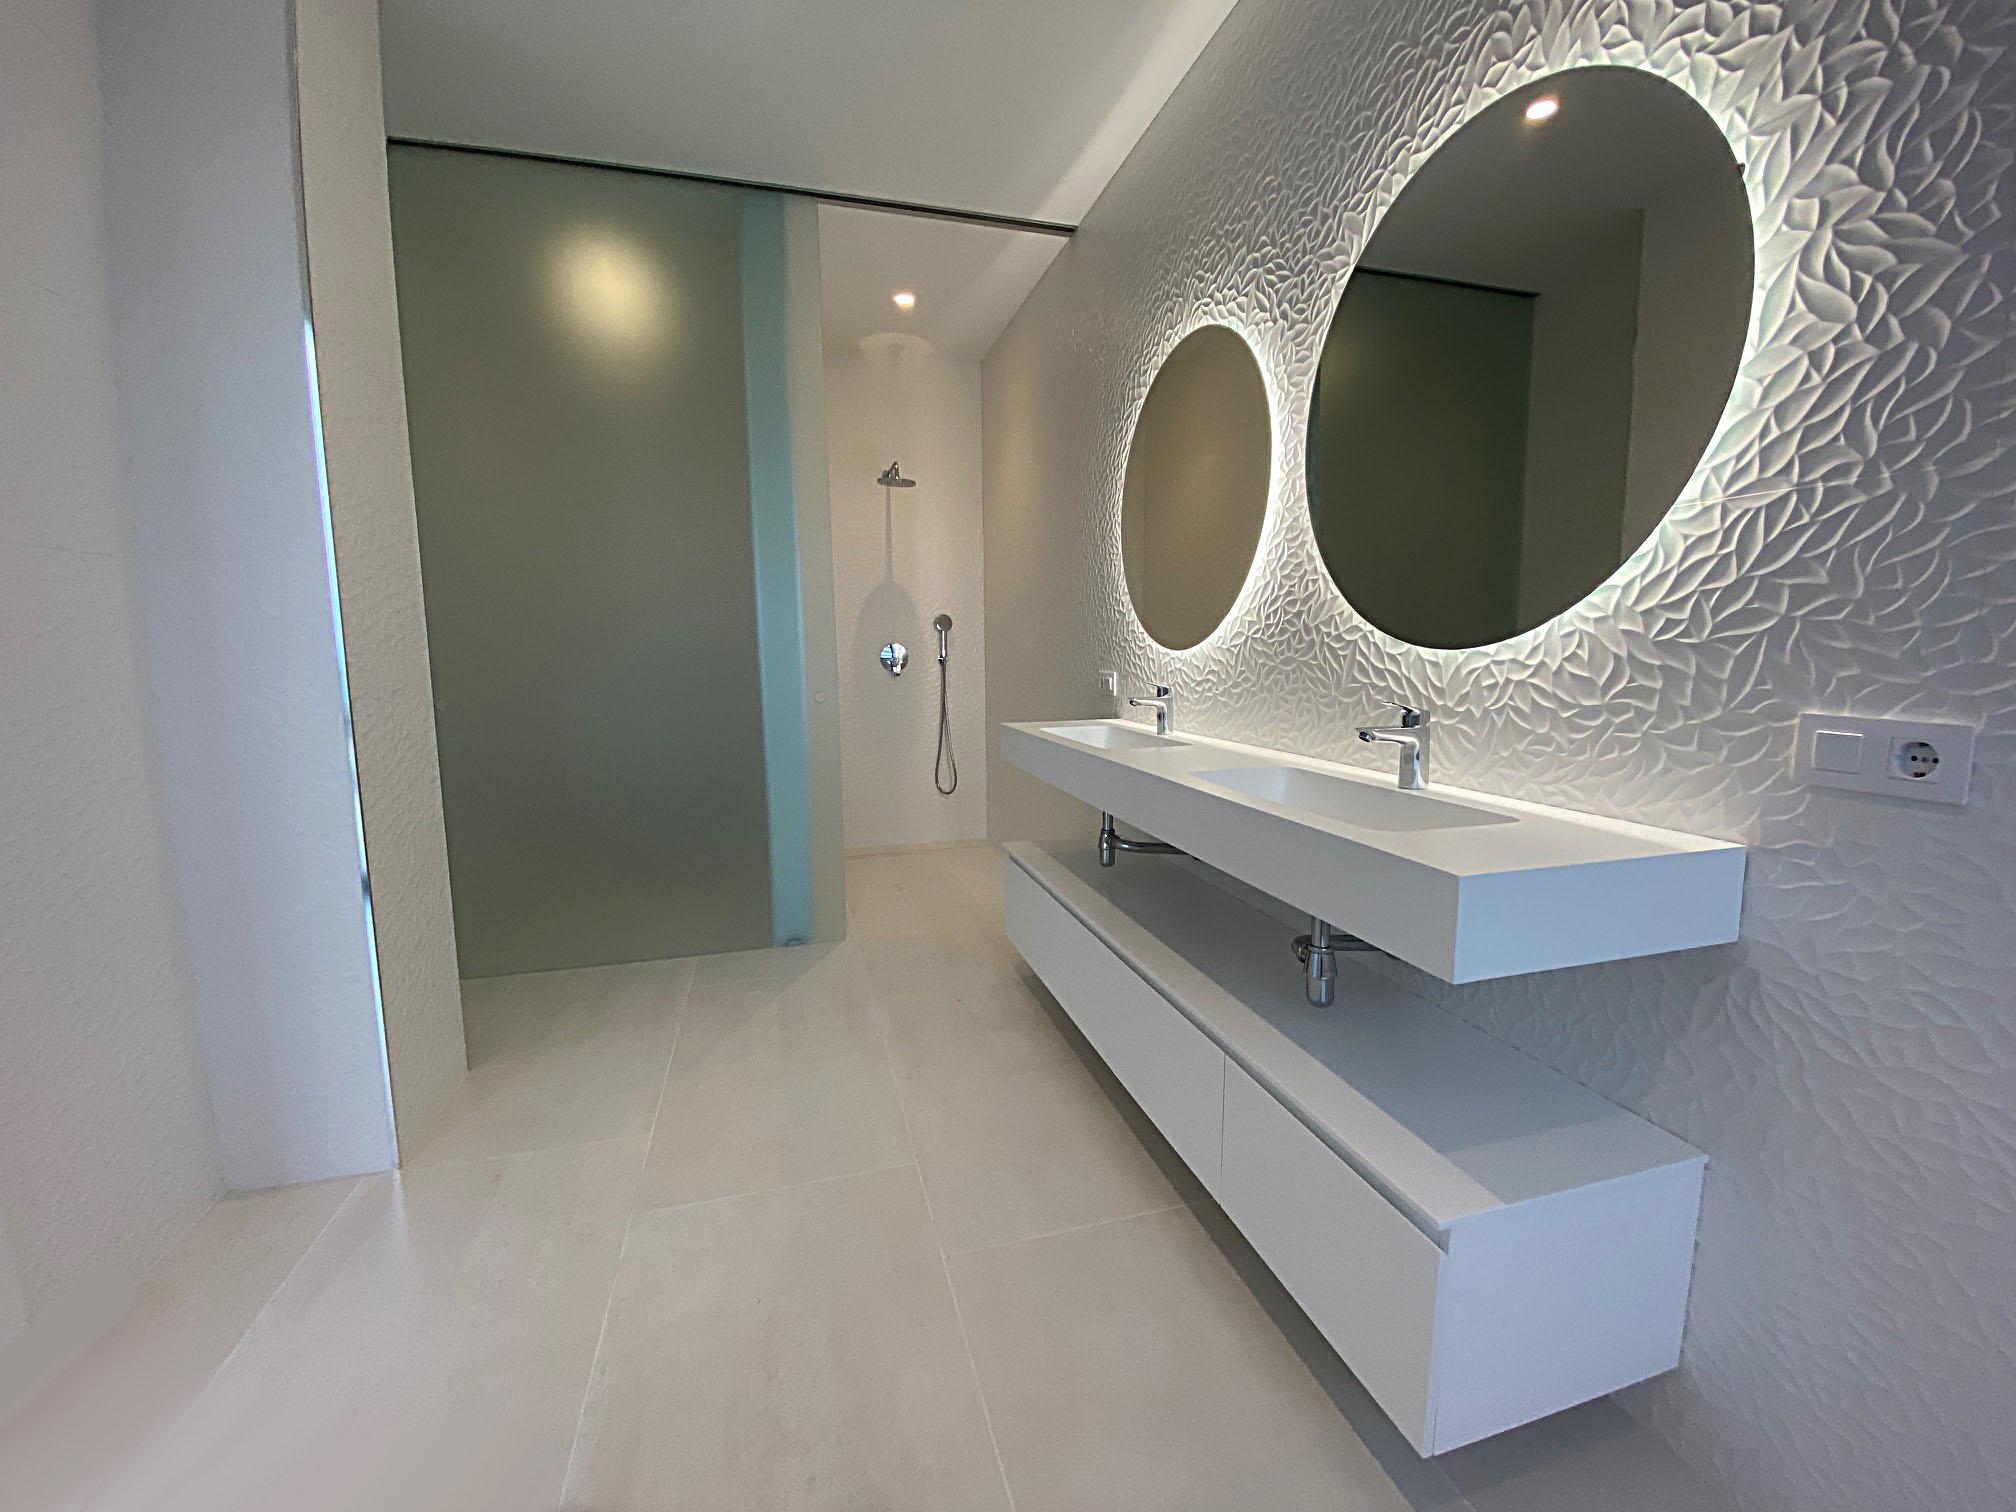 Salle de bain avec miroir ovale